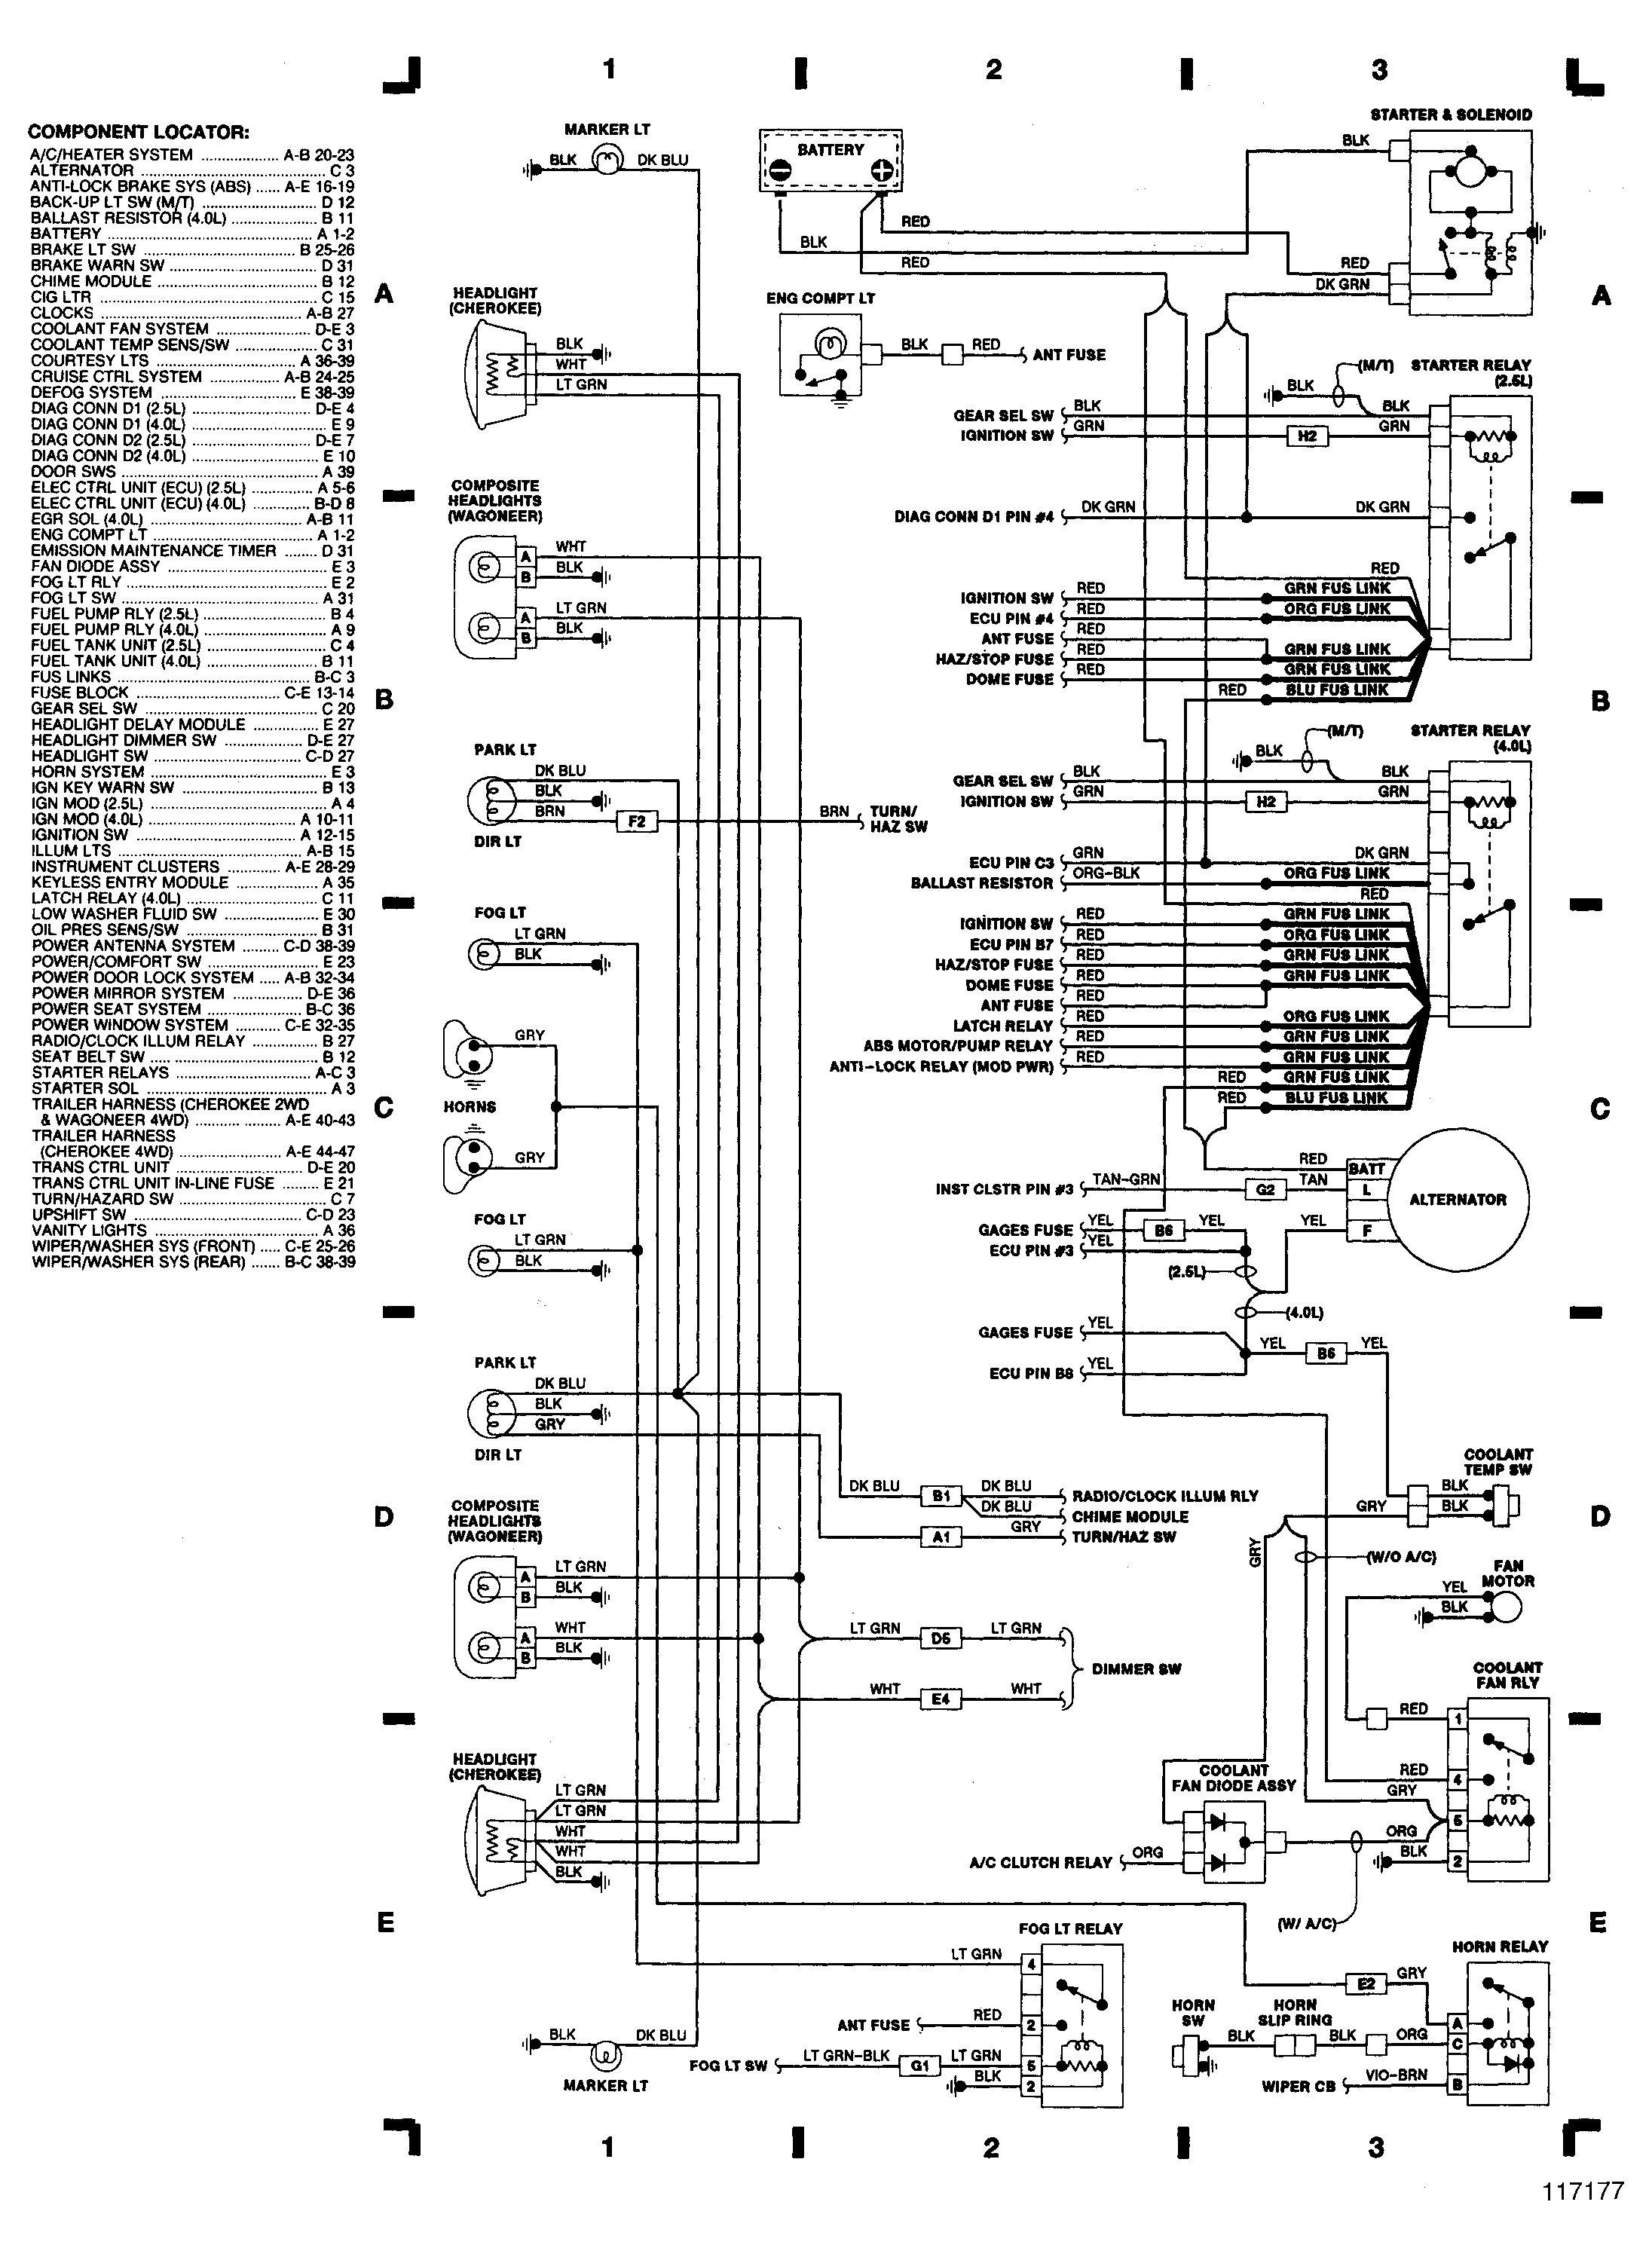 1993 Jeep Cherokee Engine Diagram 1995 Jeep Cherokee Starter Wiring Diagram Wiring Diagram Will Be A